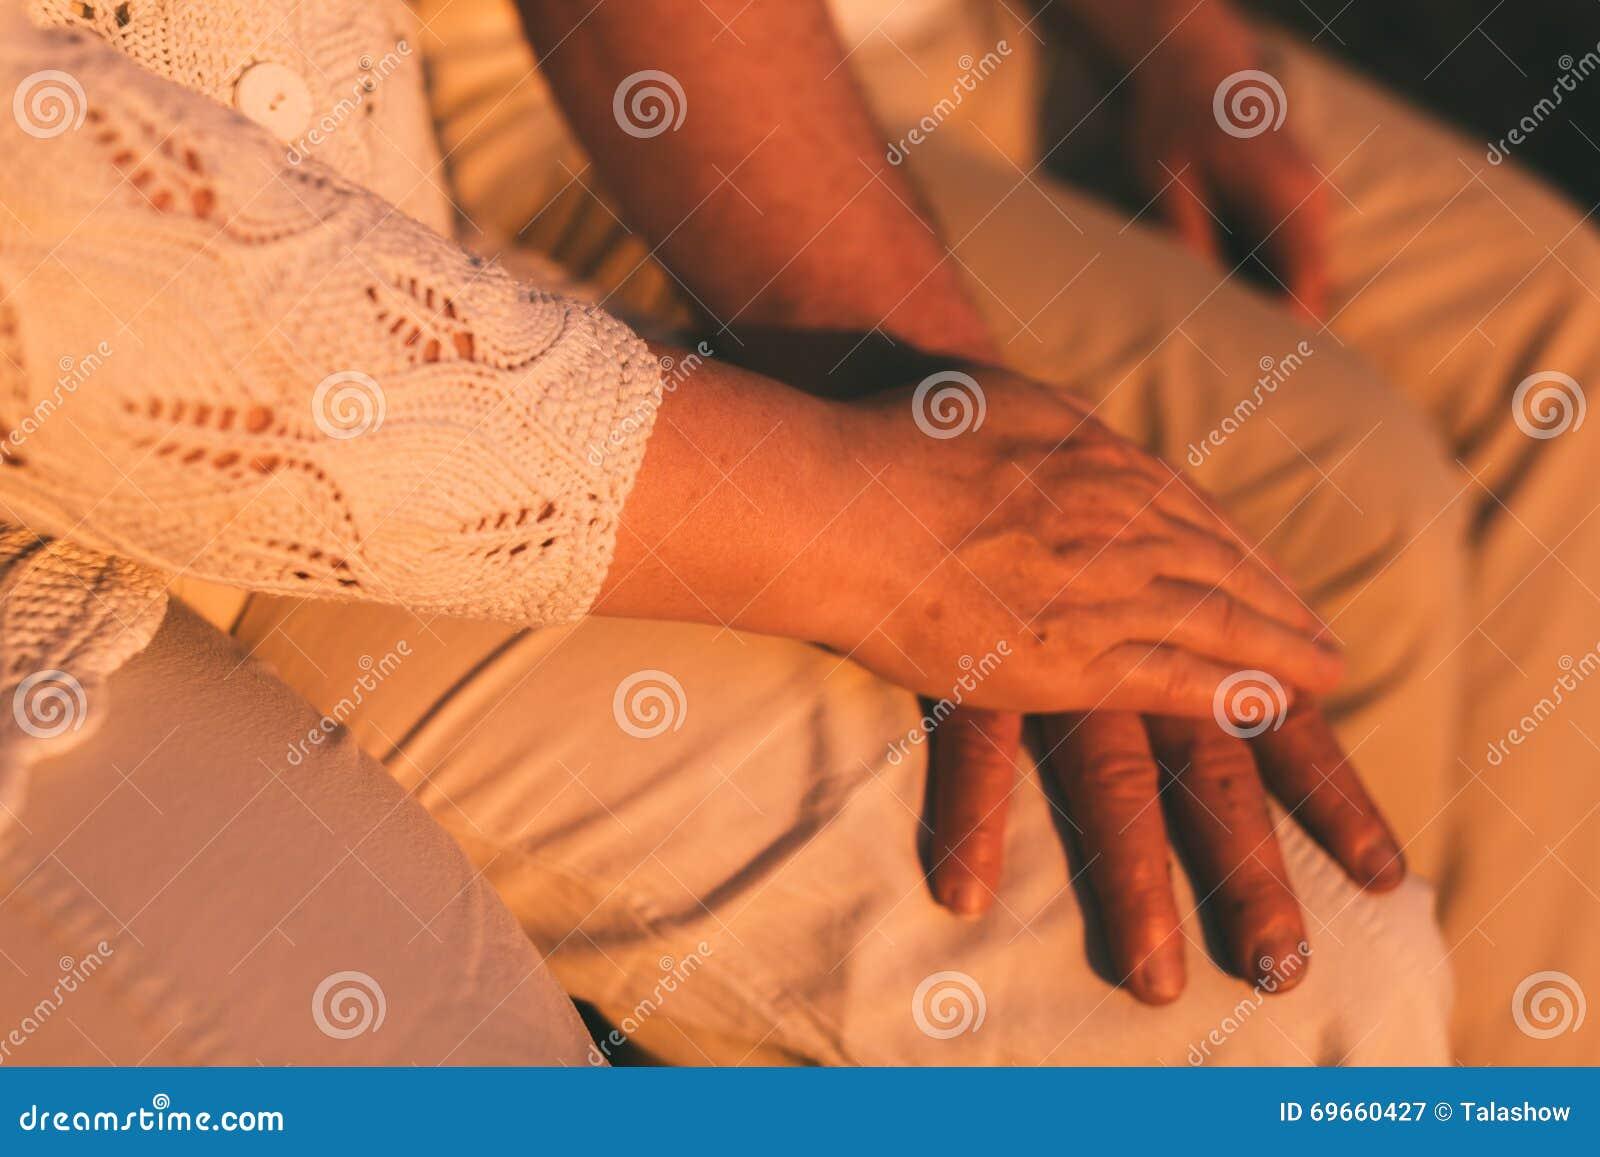 Senior Couple Hands Together Photo. Stock Photo - Image: 69660427